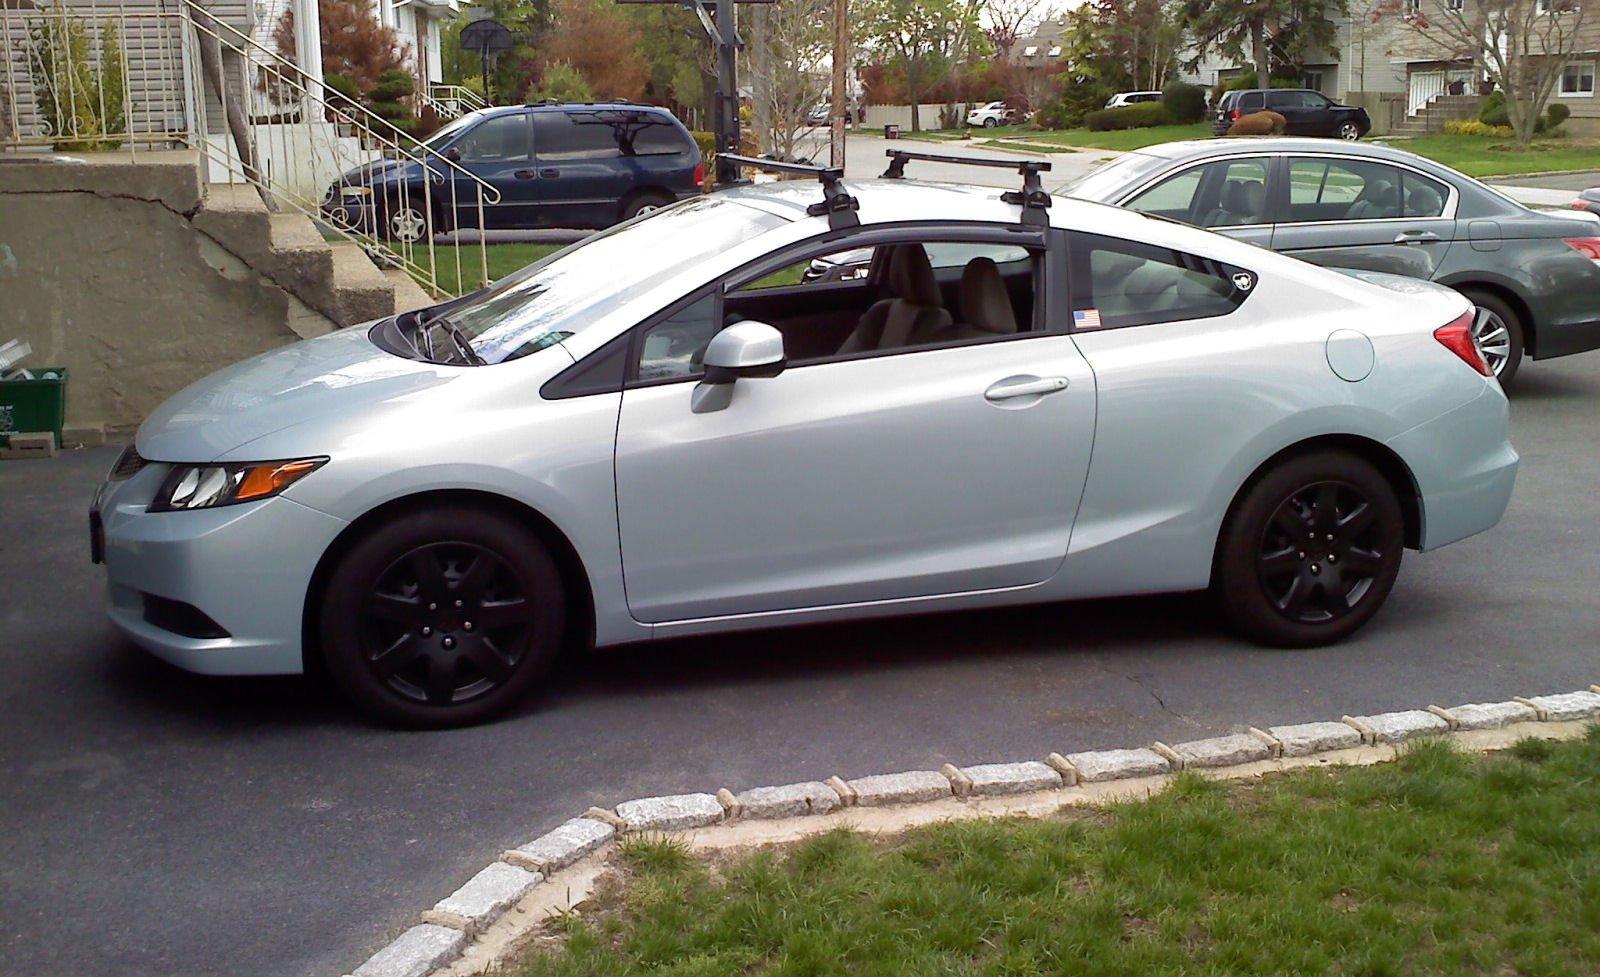 Install Honda Civic Thule 480r Arb53 Universal Roof Racks? 0513131652